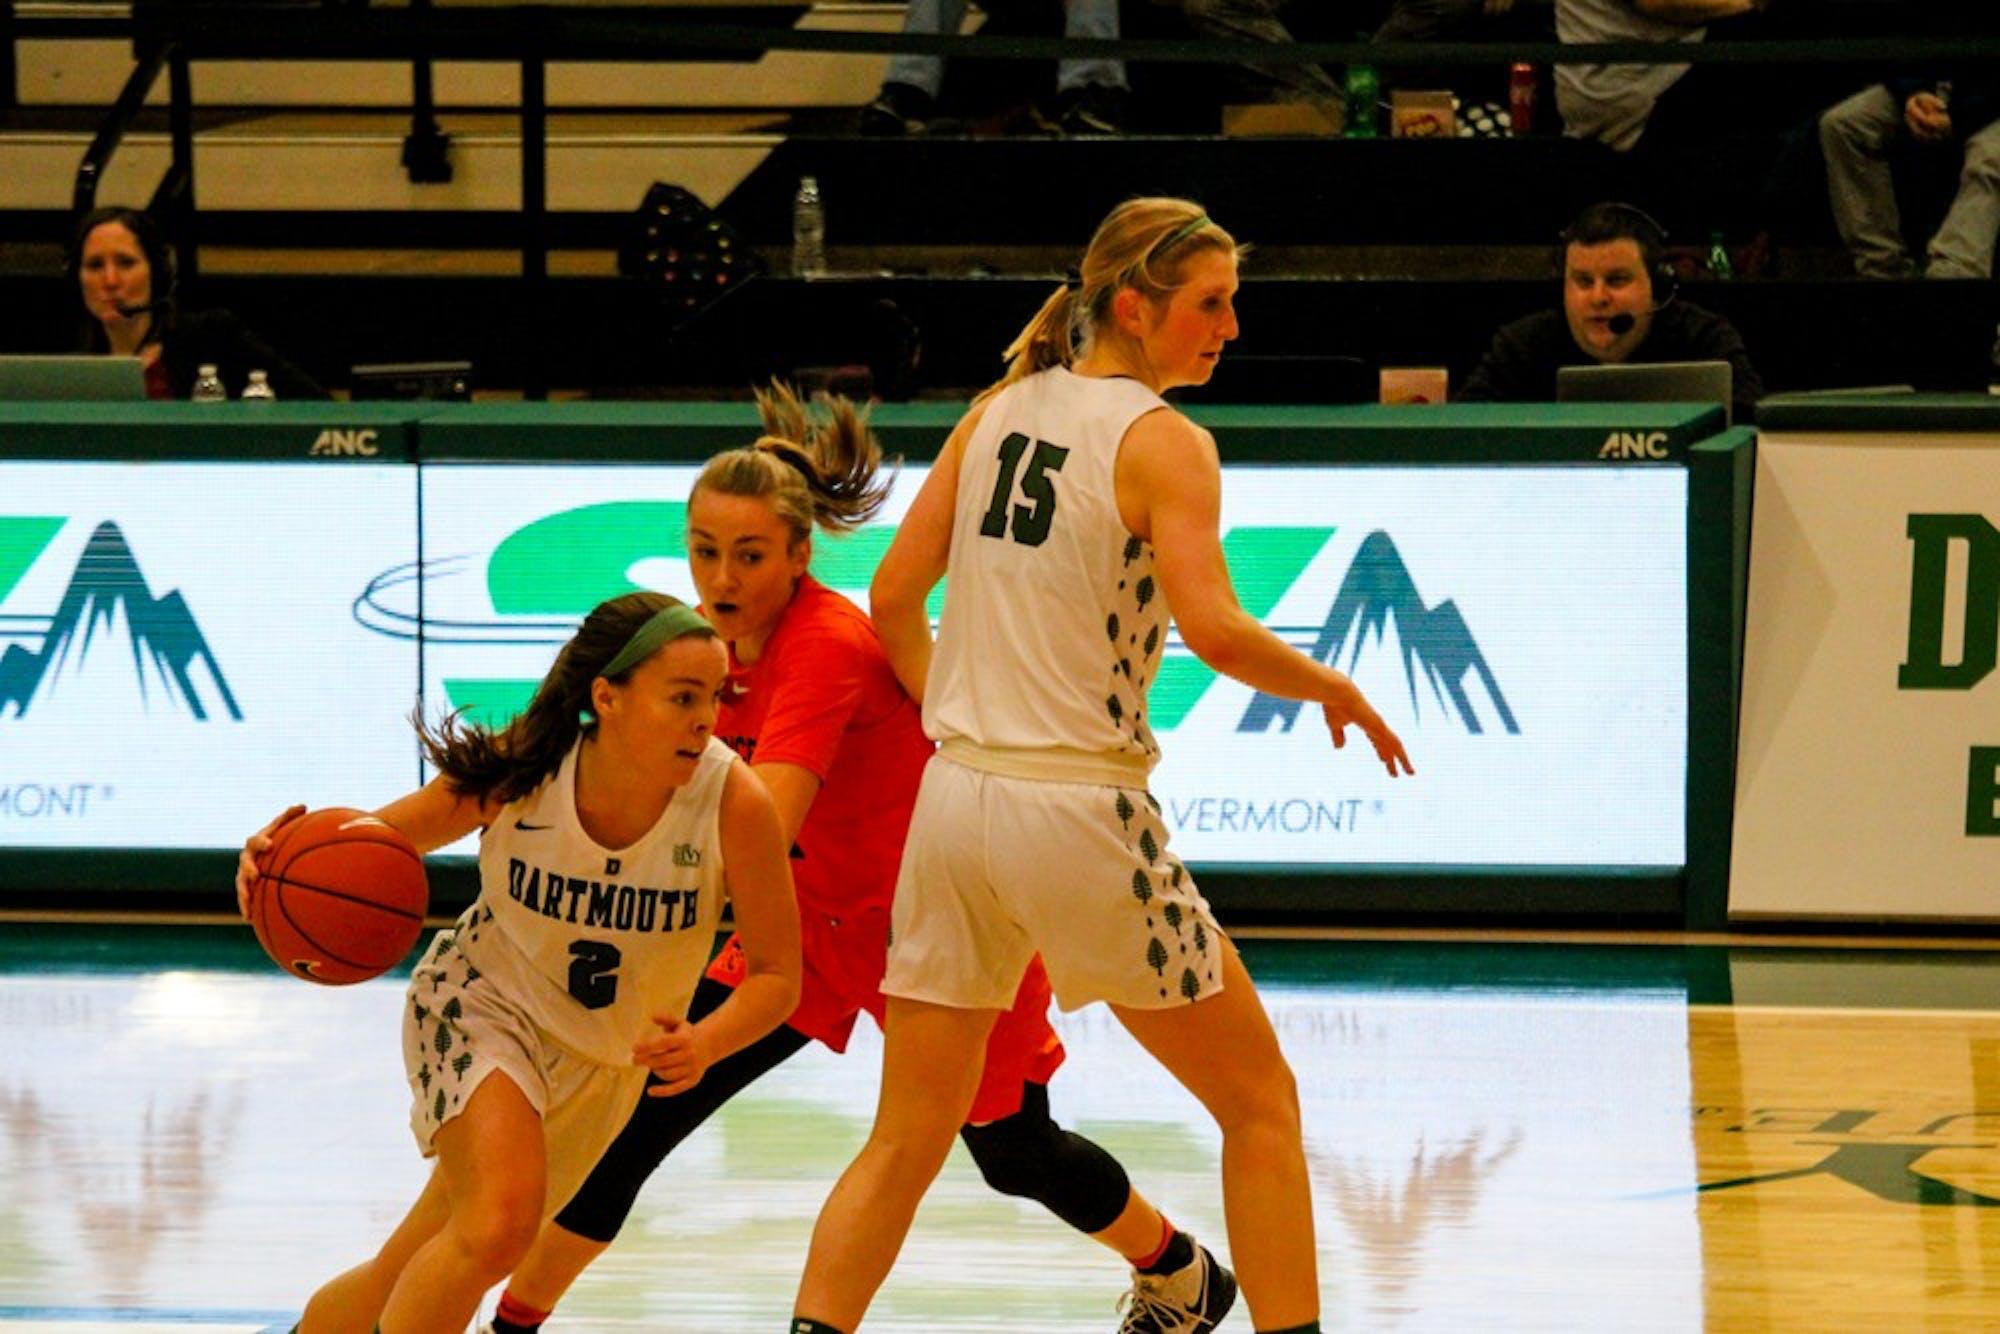 2-3-20-sports-womensbasketball2-lorraineliu